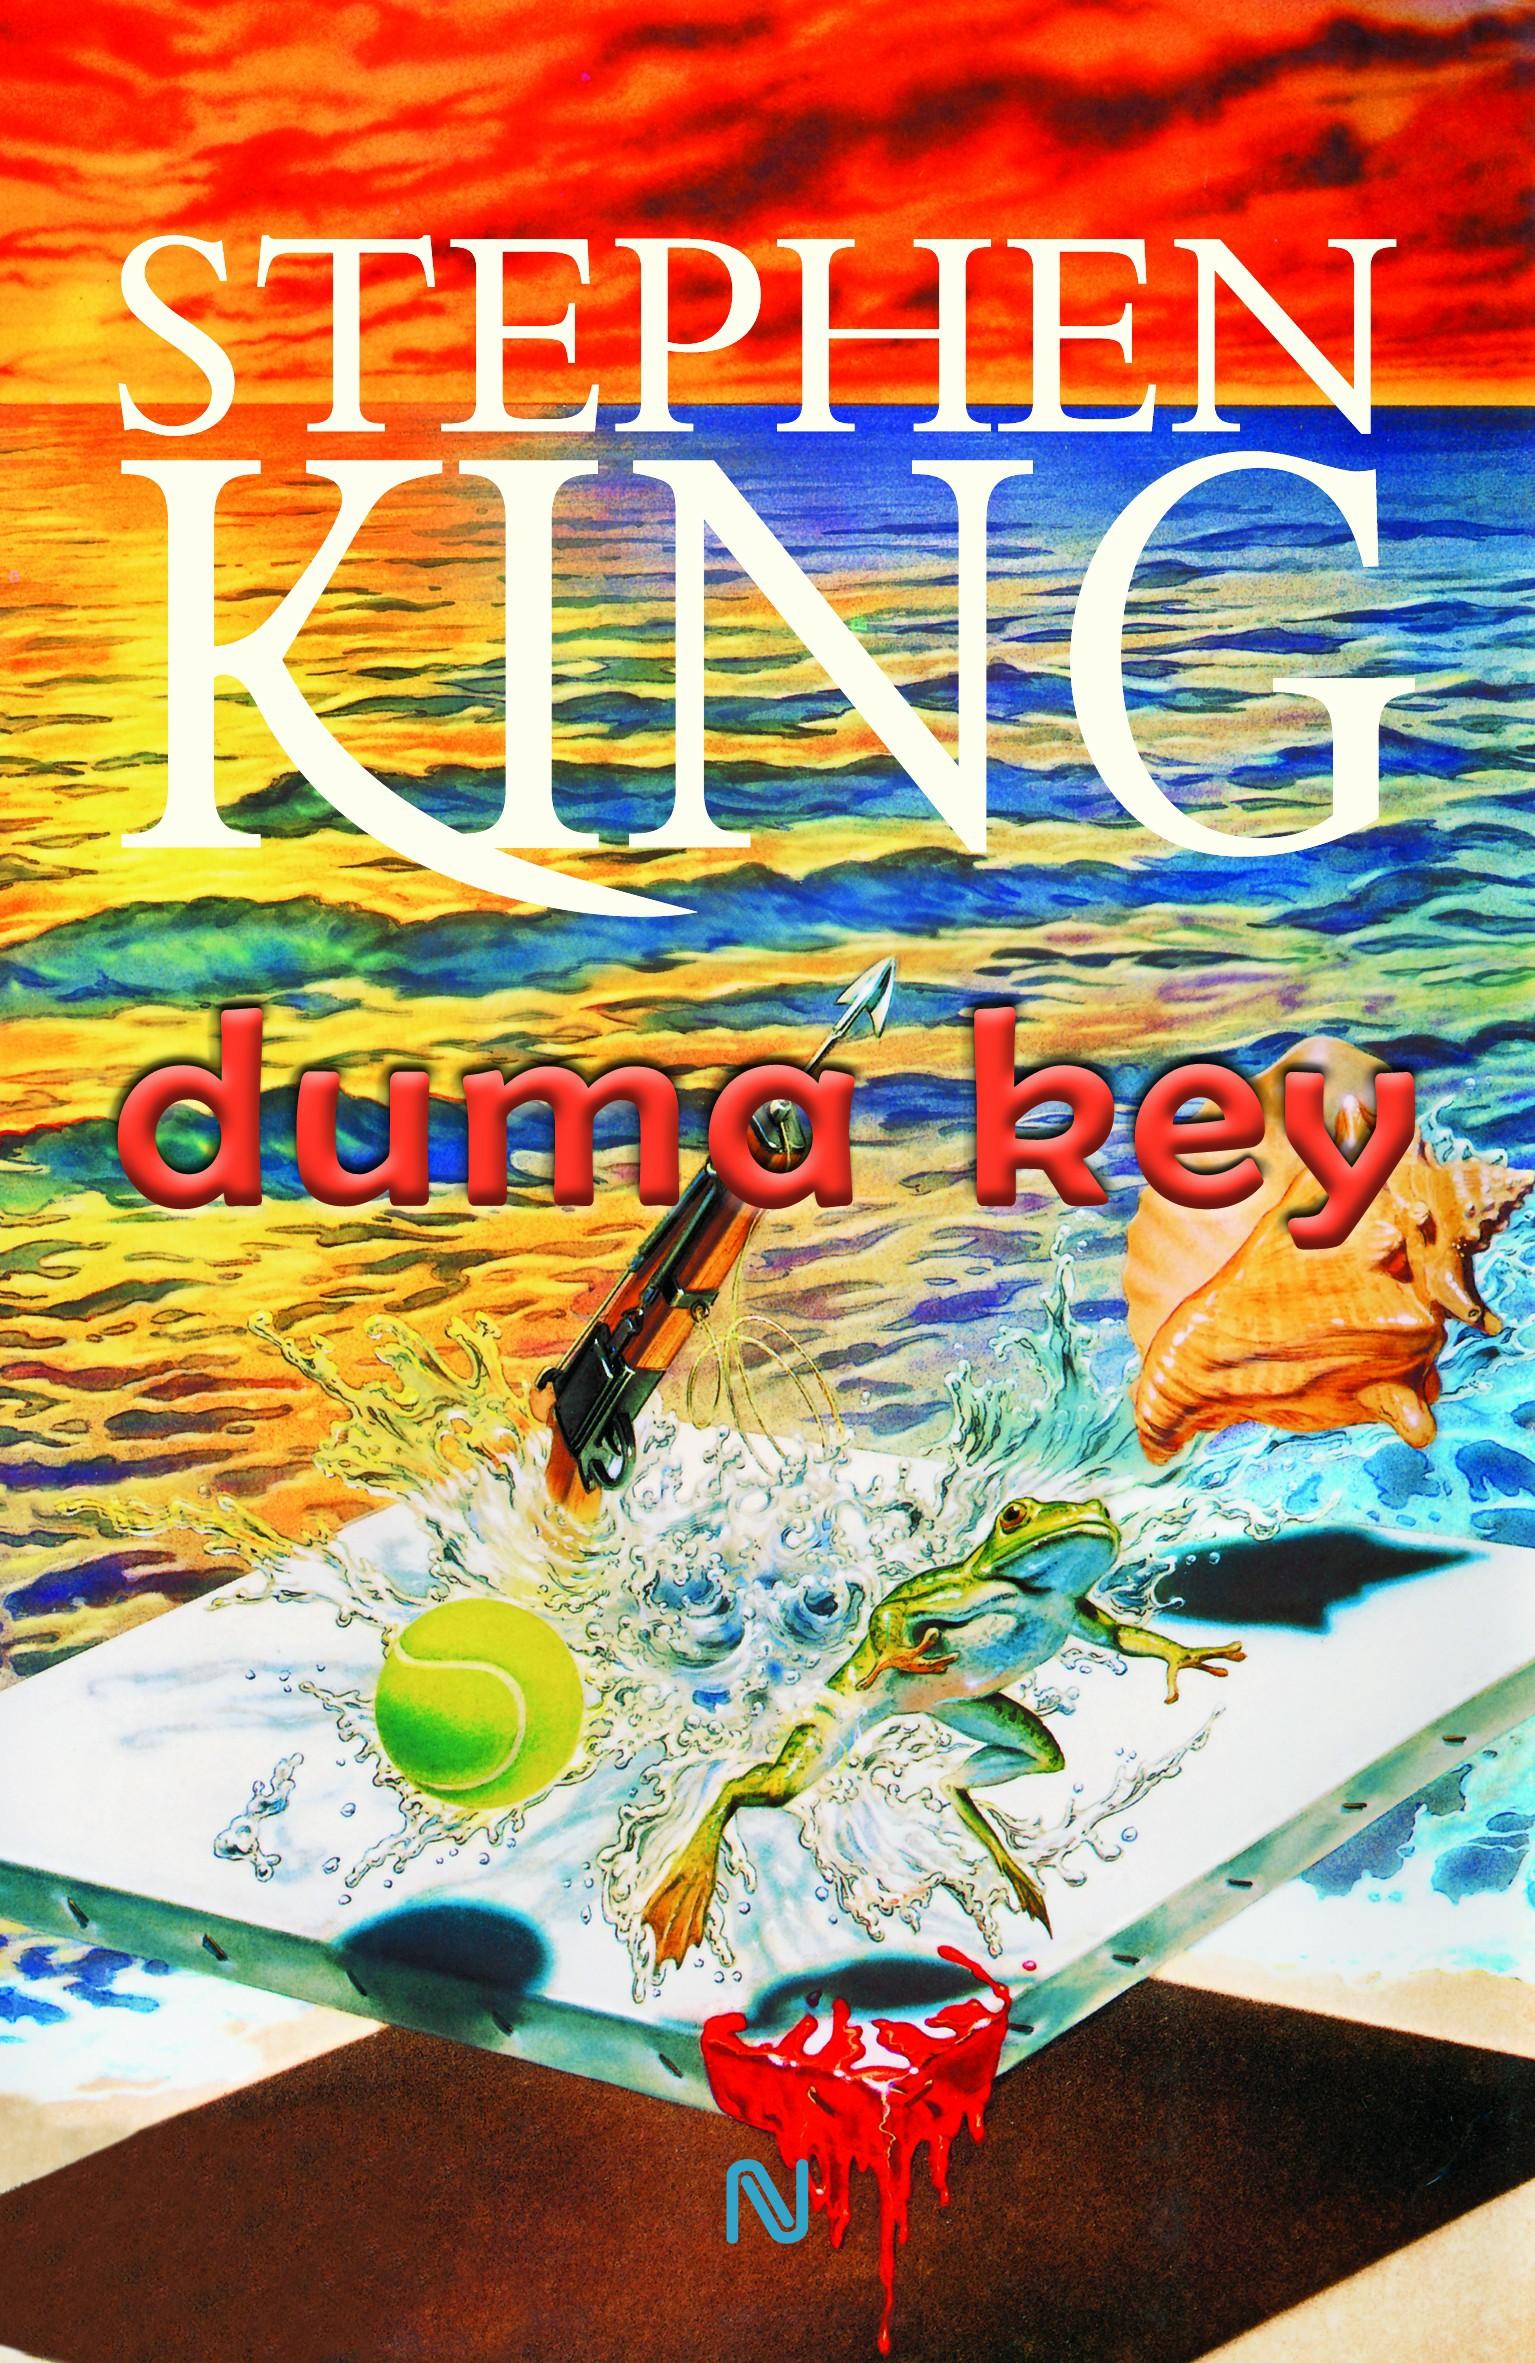 Guest post: Cum m-a prins Stephen King în mreje (2) – Traducerile